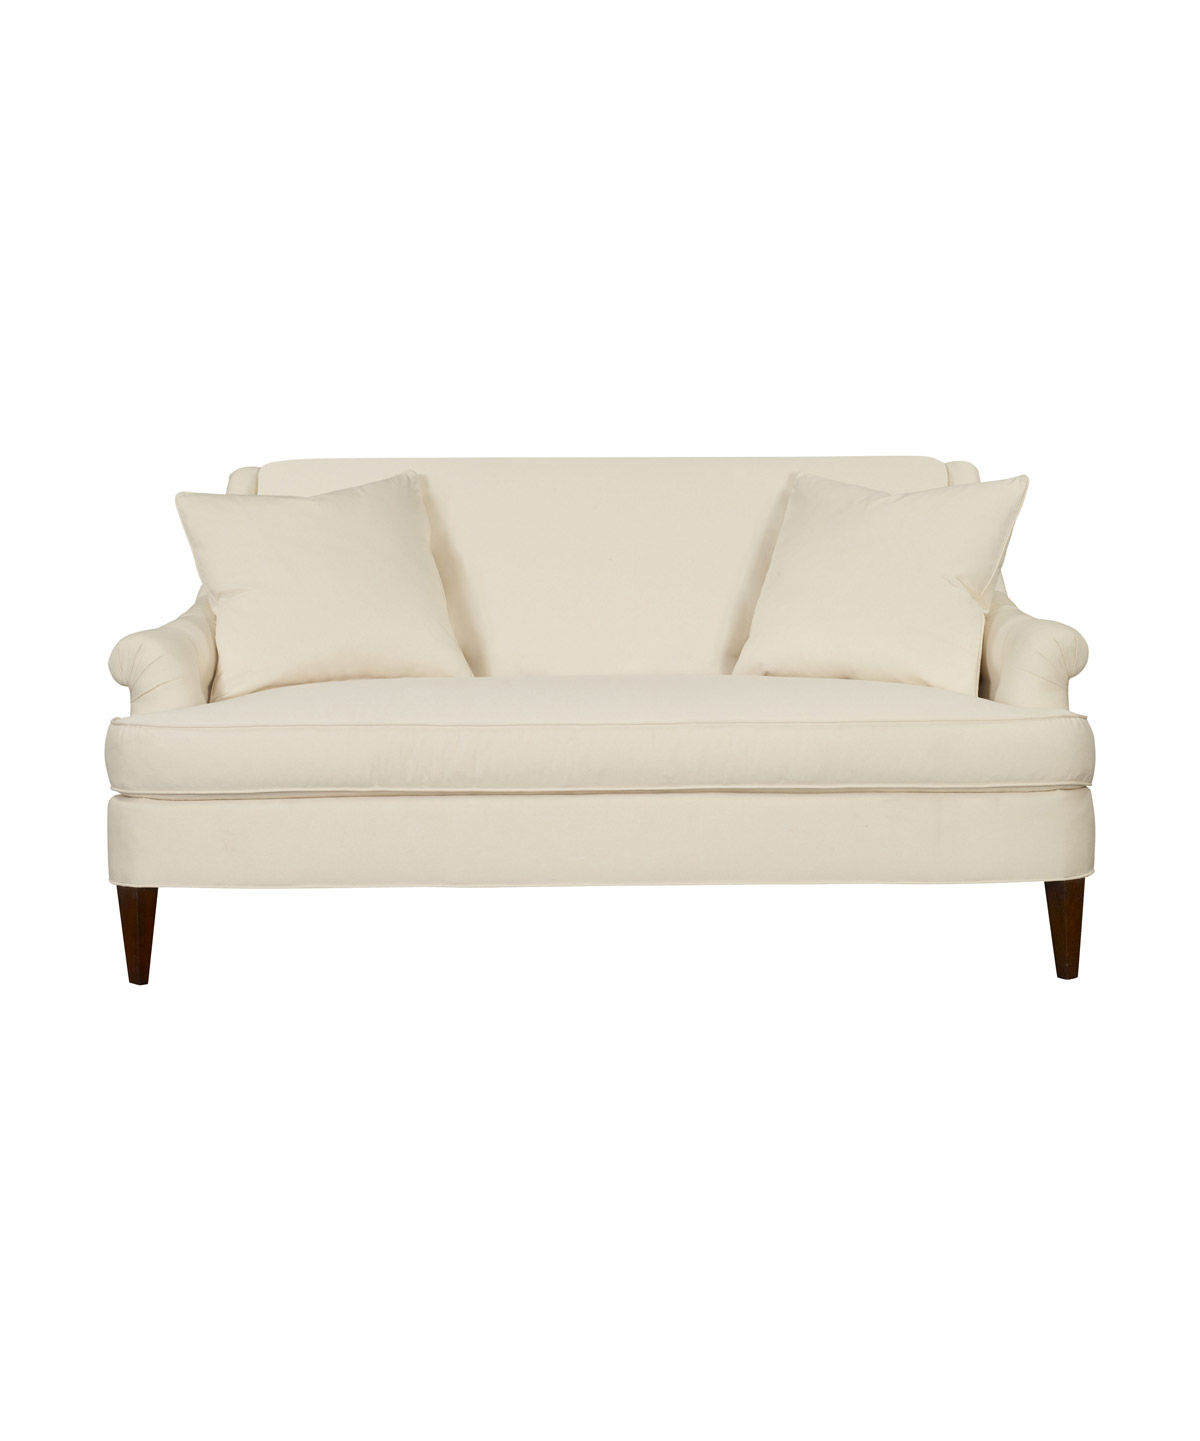 Marler Apartment Sofa